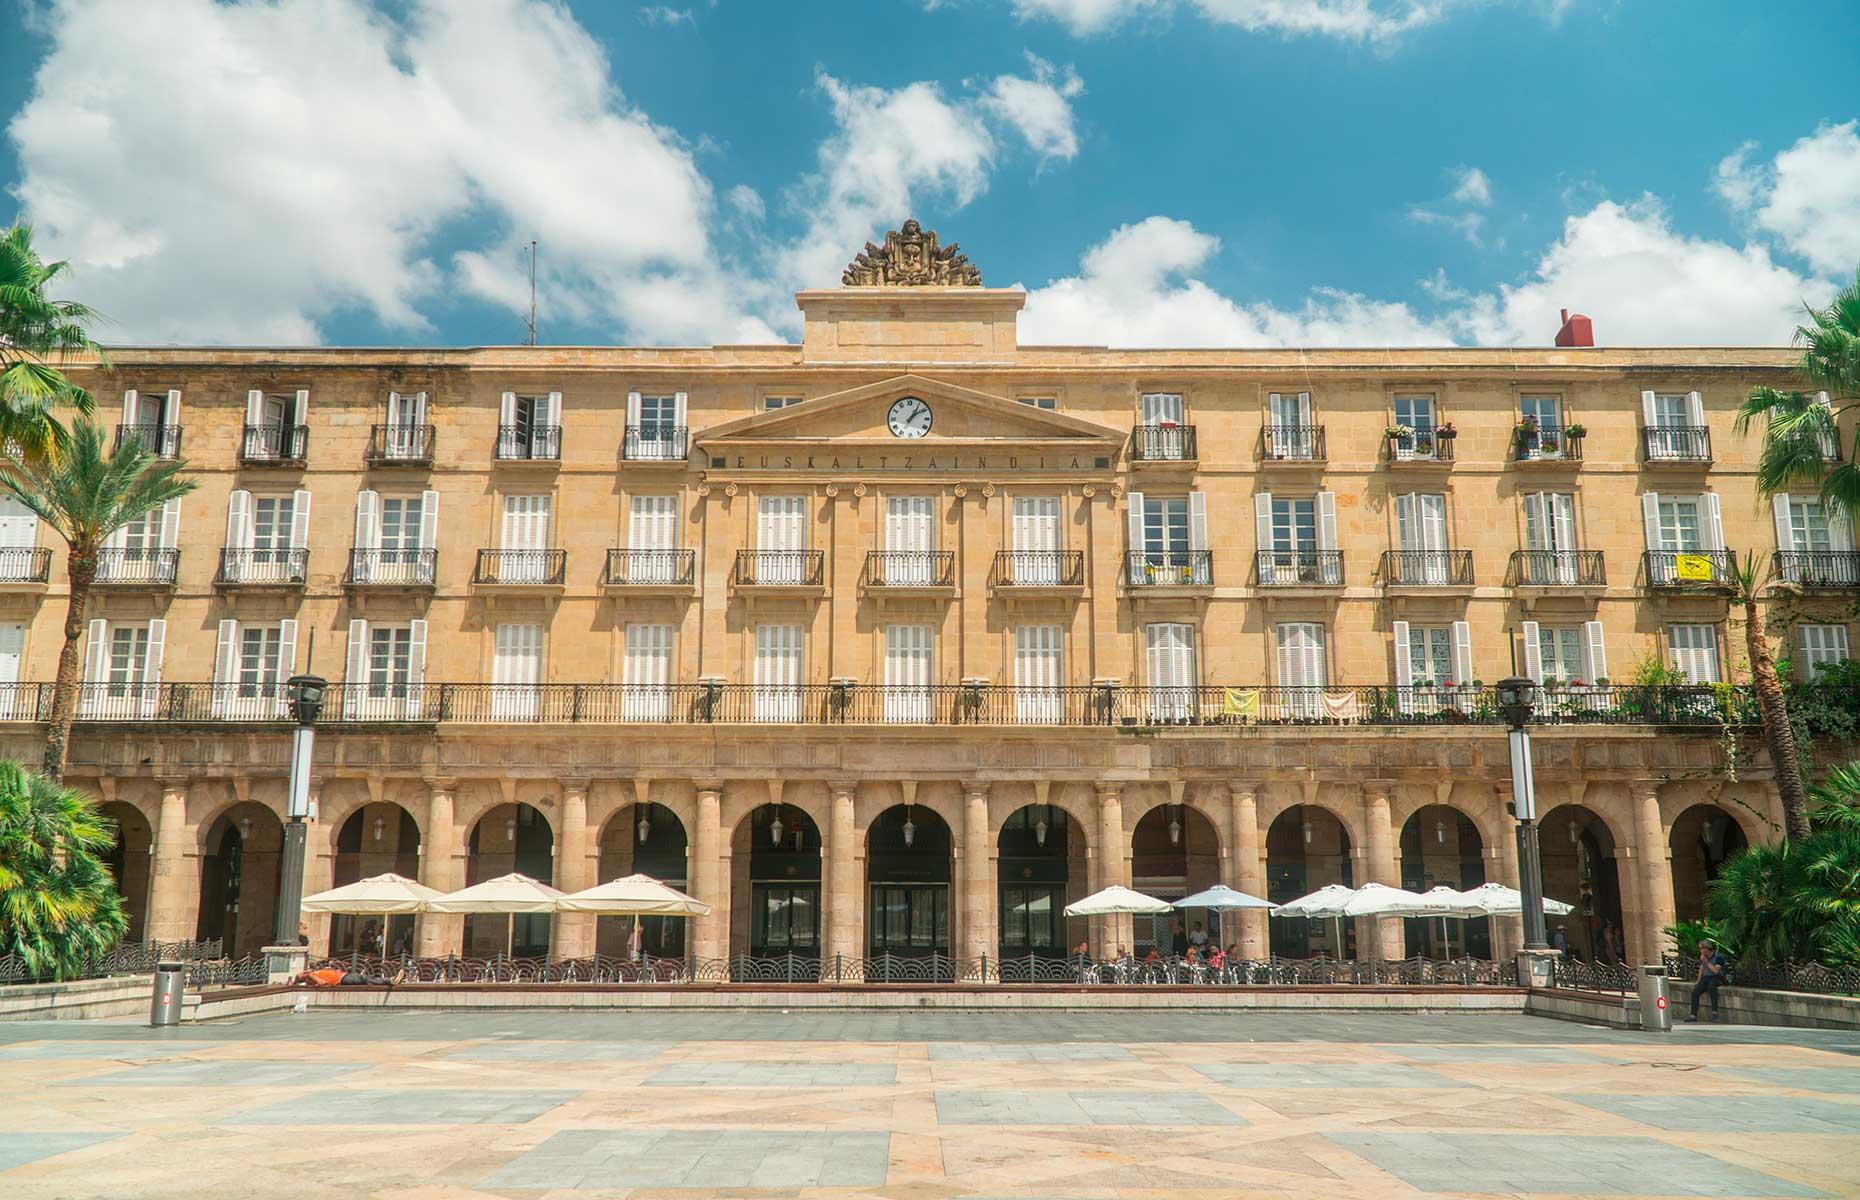 Plaza Nueva, Bilbao (Image: Jam Travels/Shutterstock)